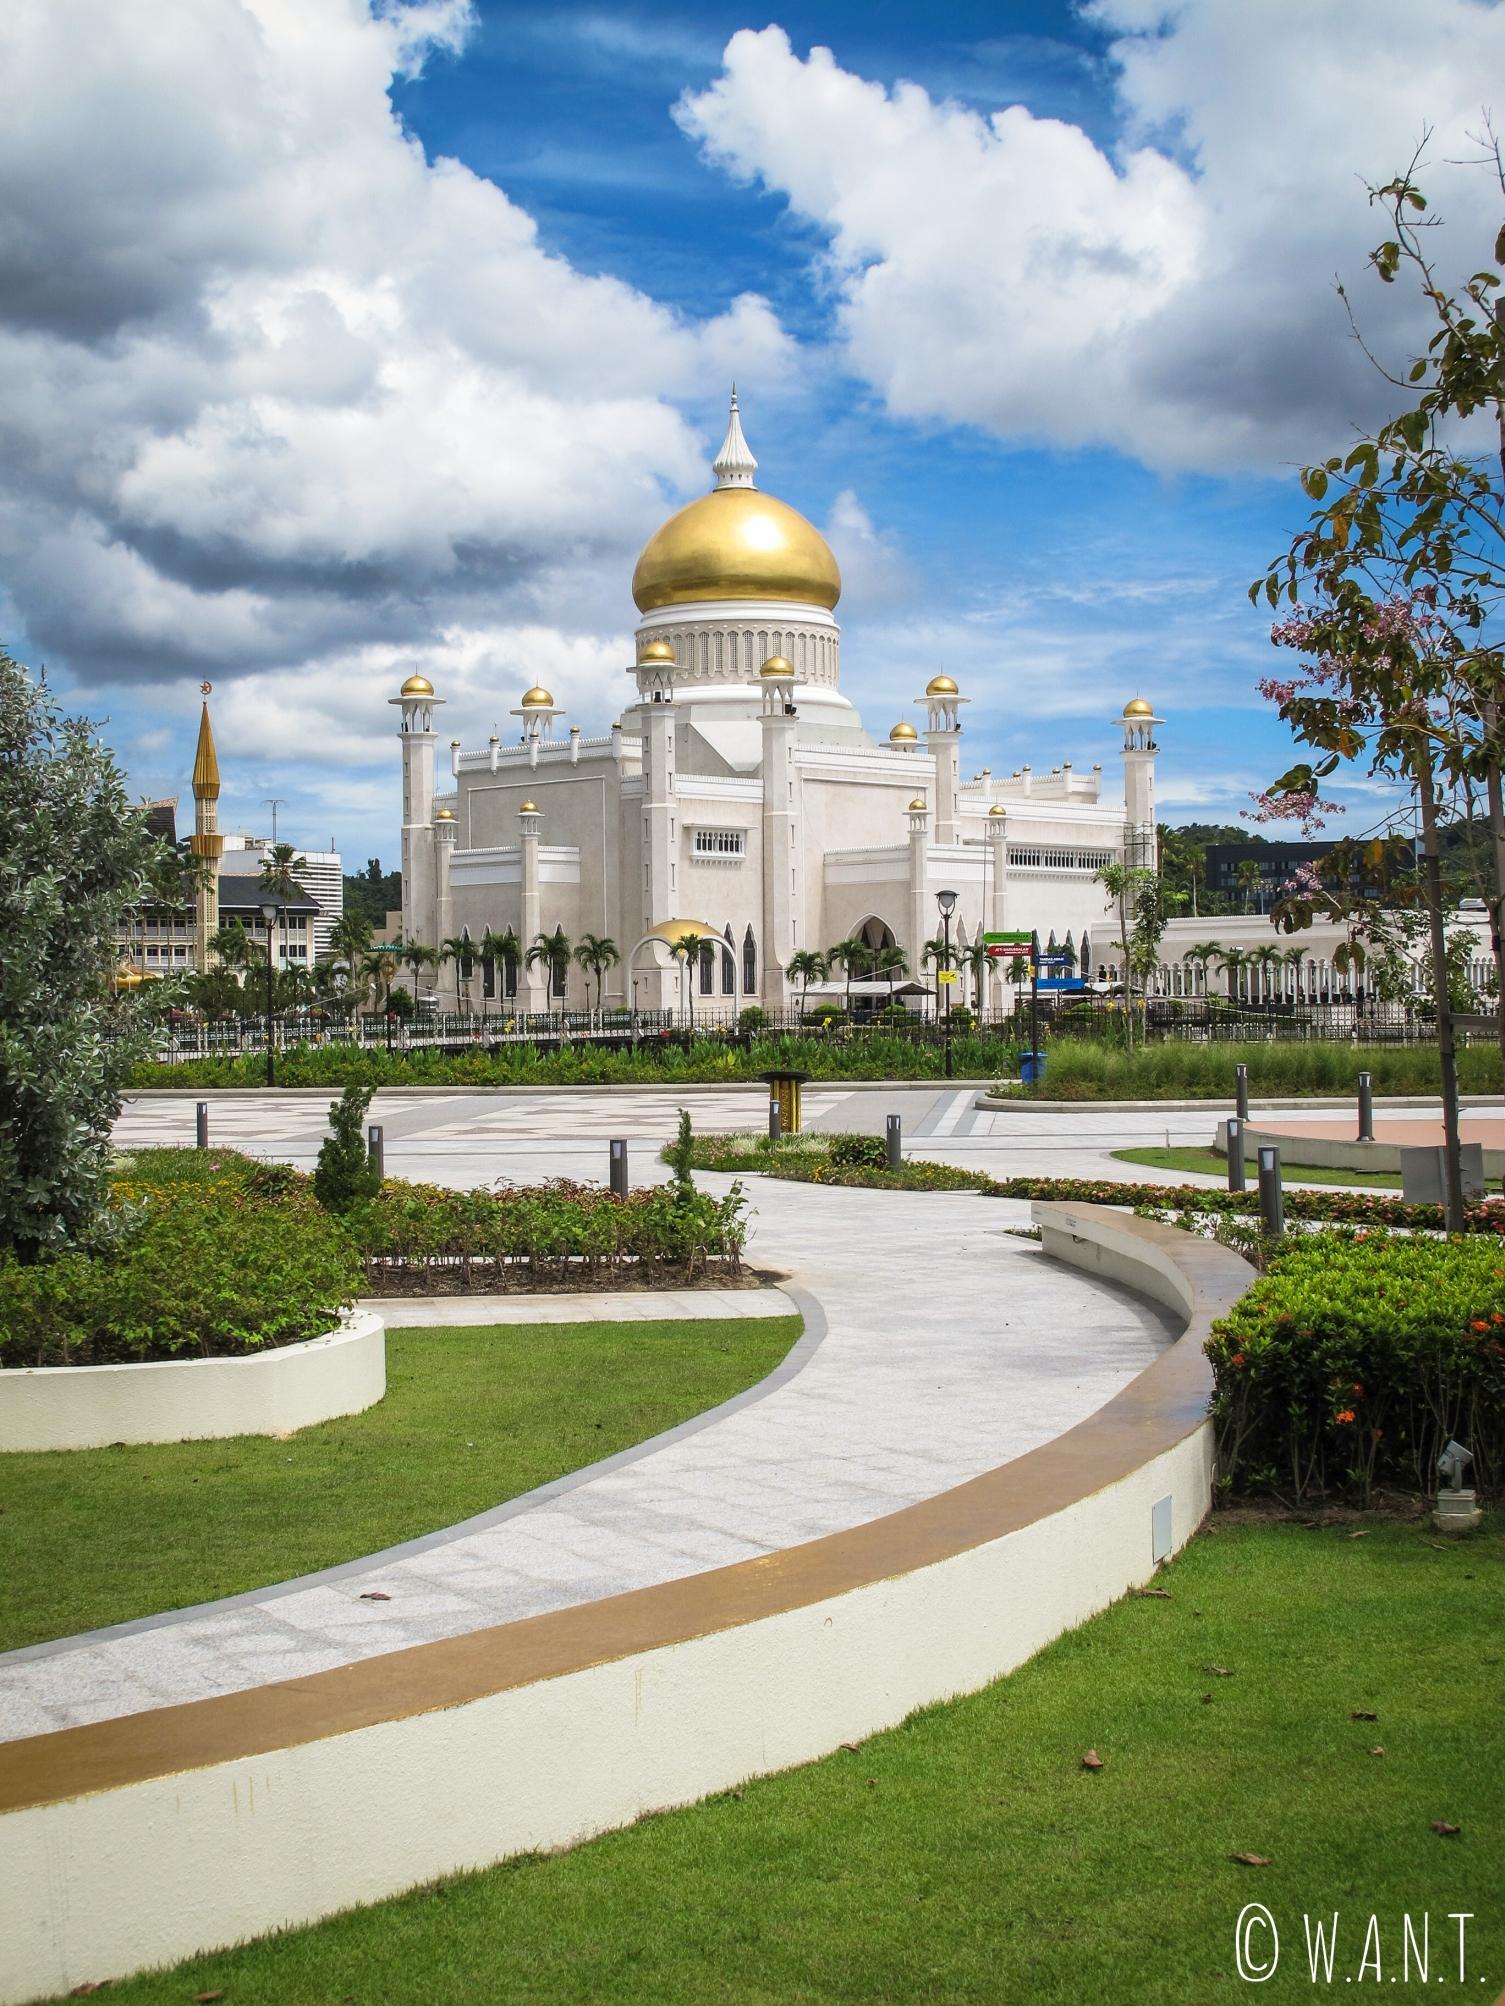 Vue sur la mosquée Masjid Omar Ali Saifuddien de Bandar Seri Begawan depuis ses jardins